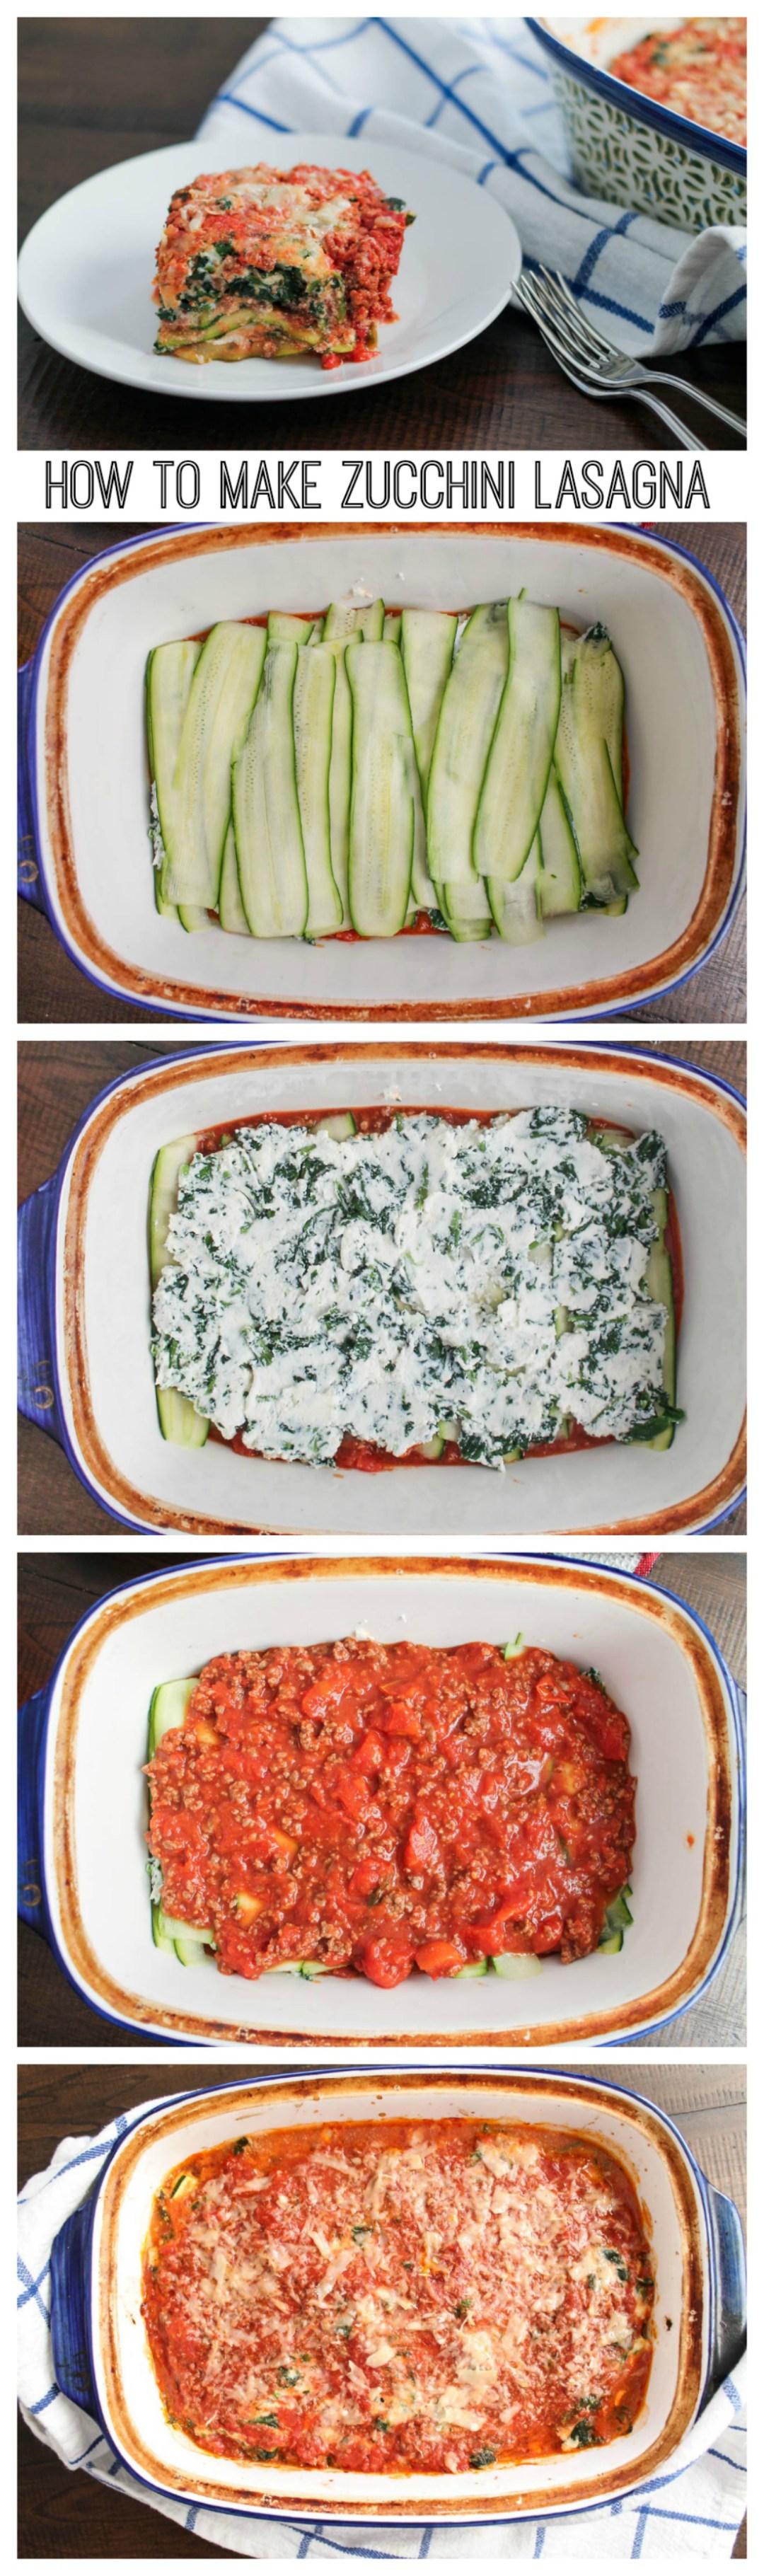 How to make zucchini lasagna vegetarian recipes low